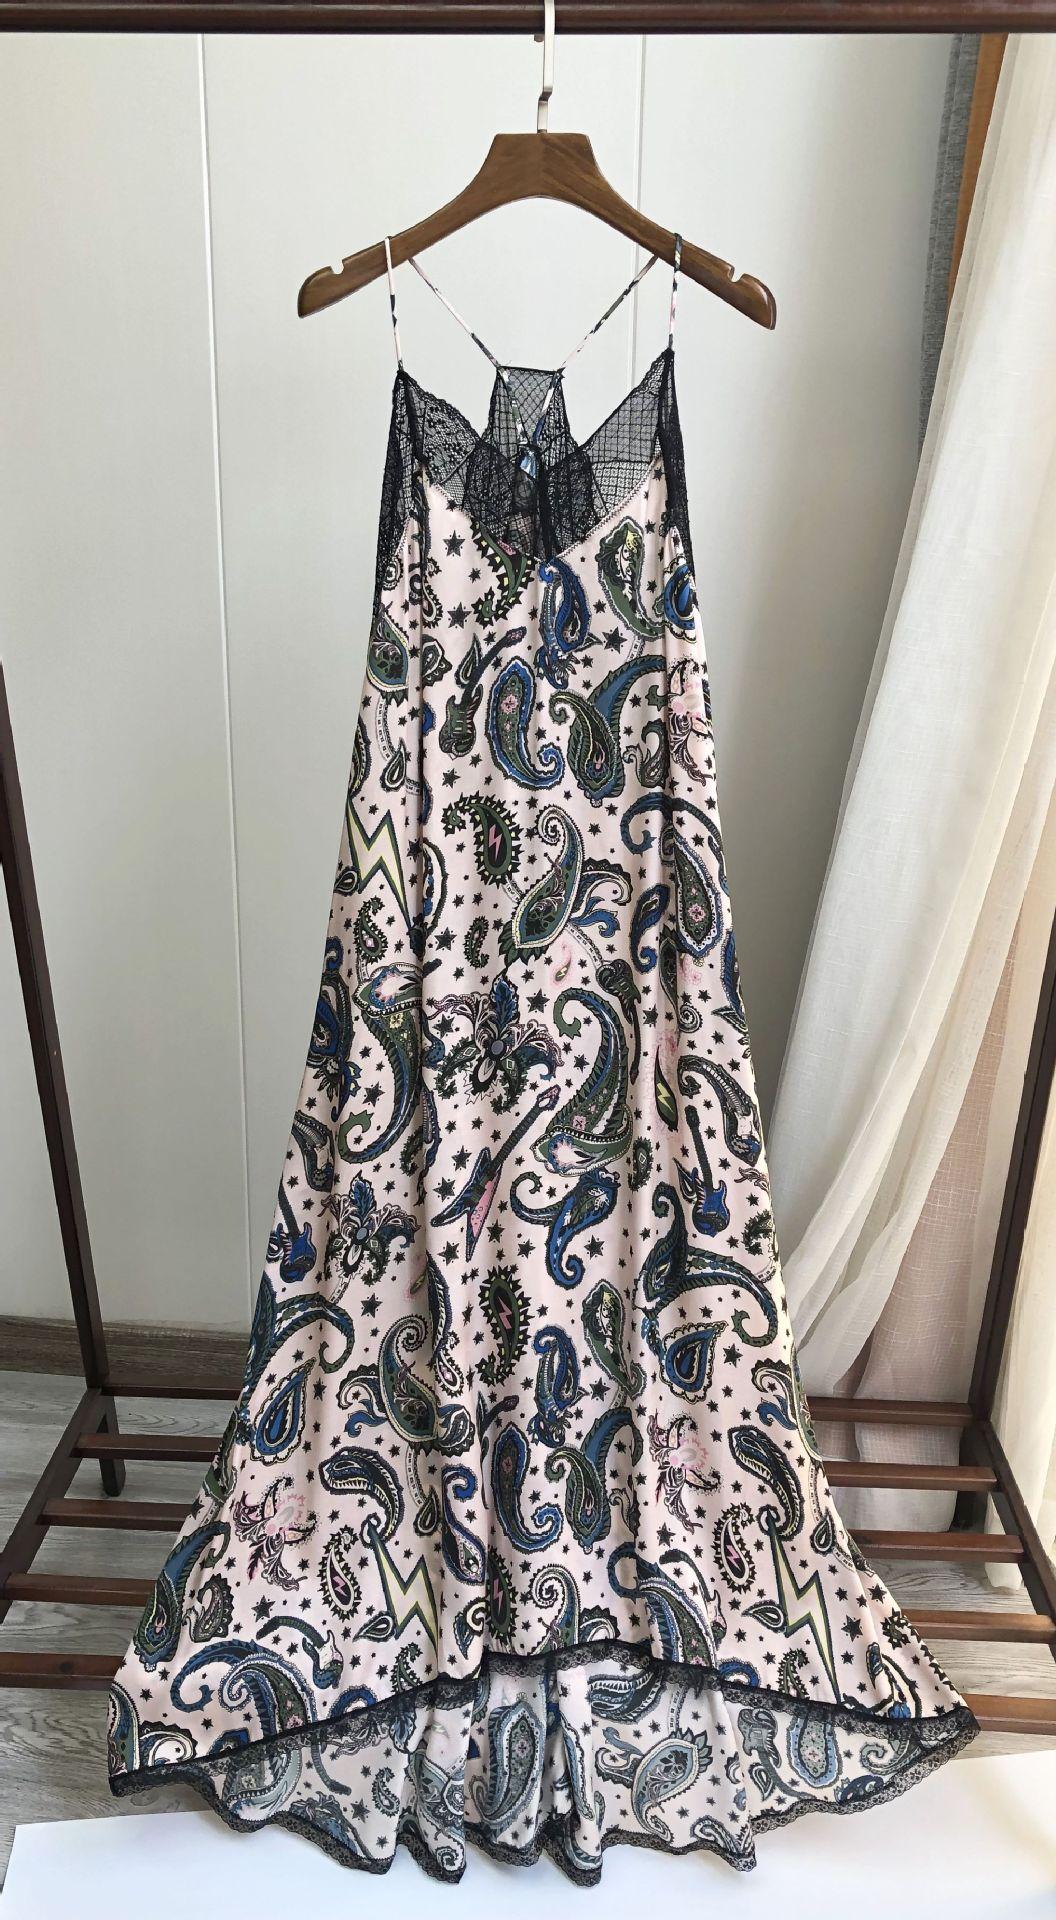 Image 2 - Women Dress 100% Viscose  Romantic Print Cashew Printed Halter Lace Midi DressDresses